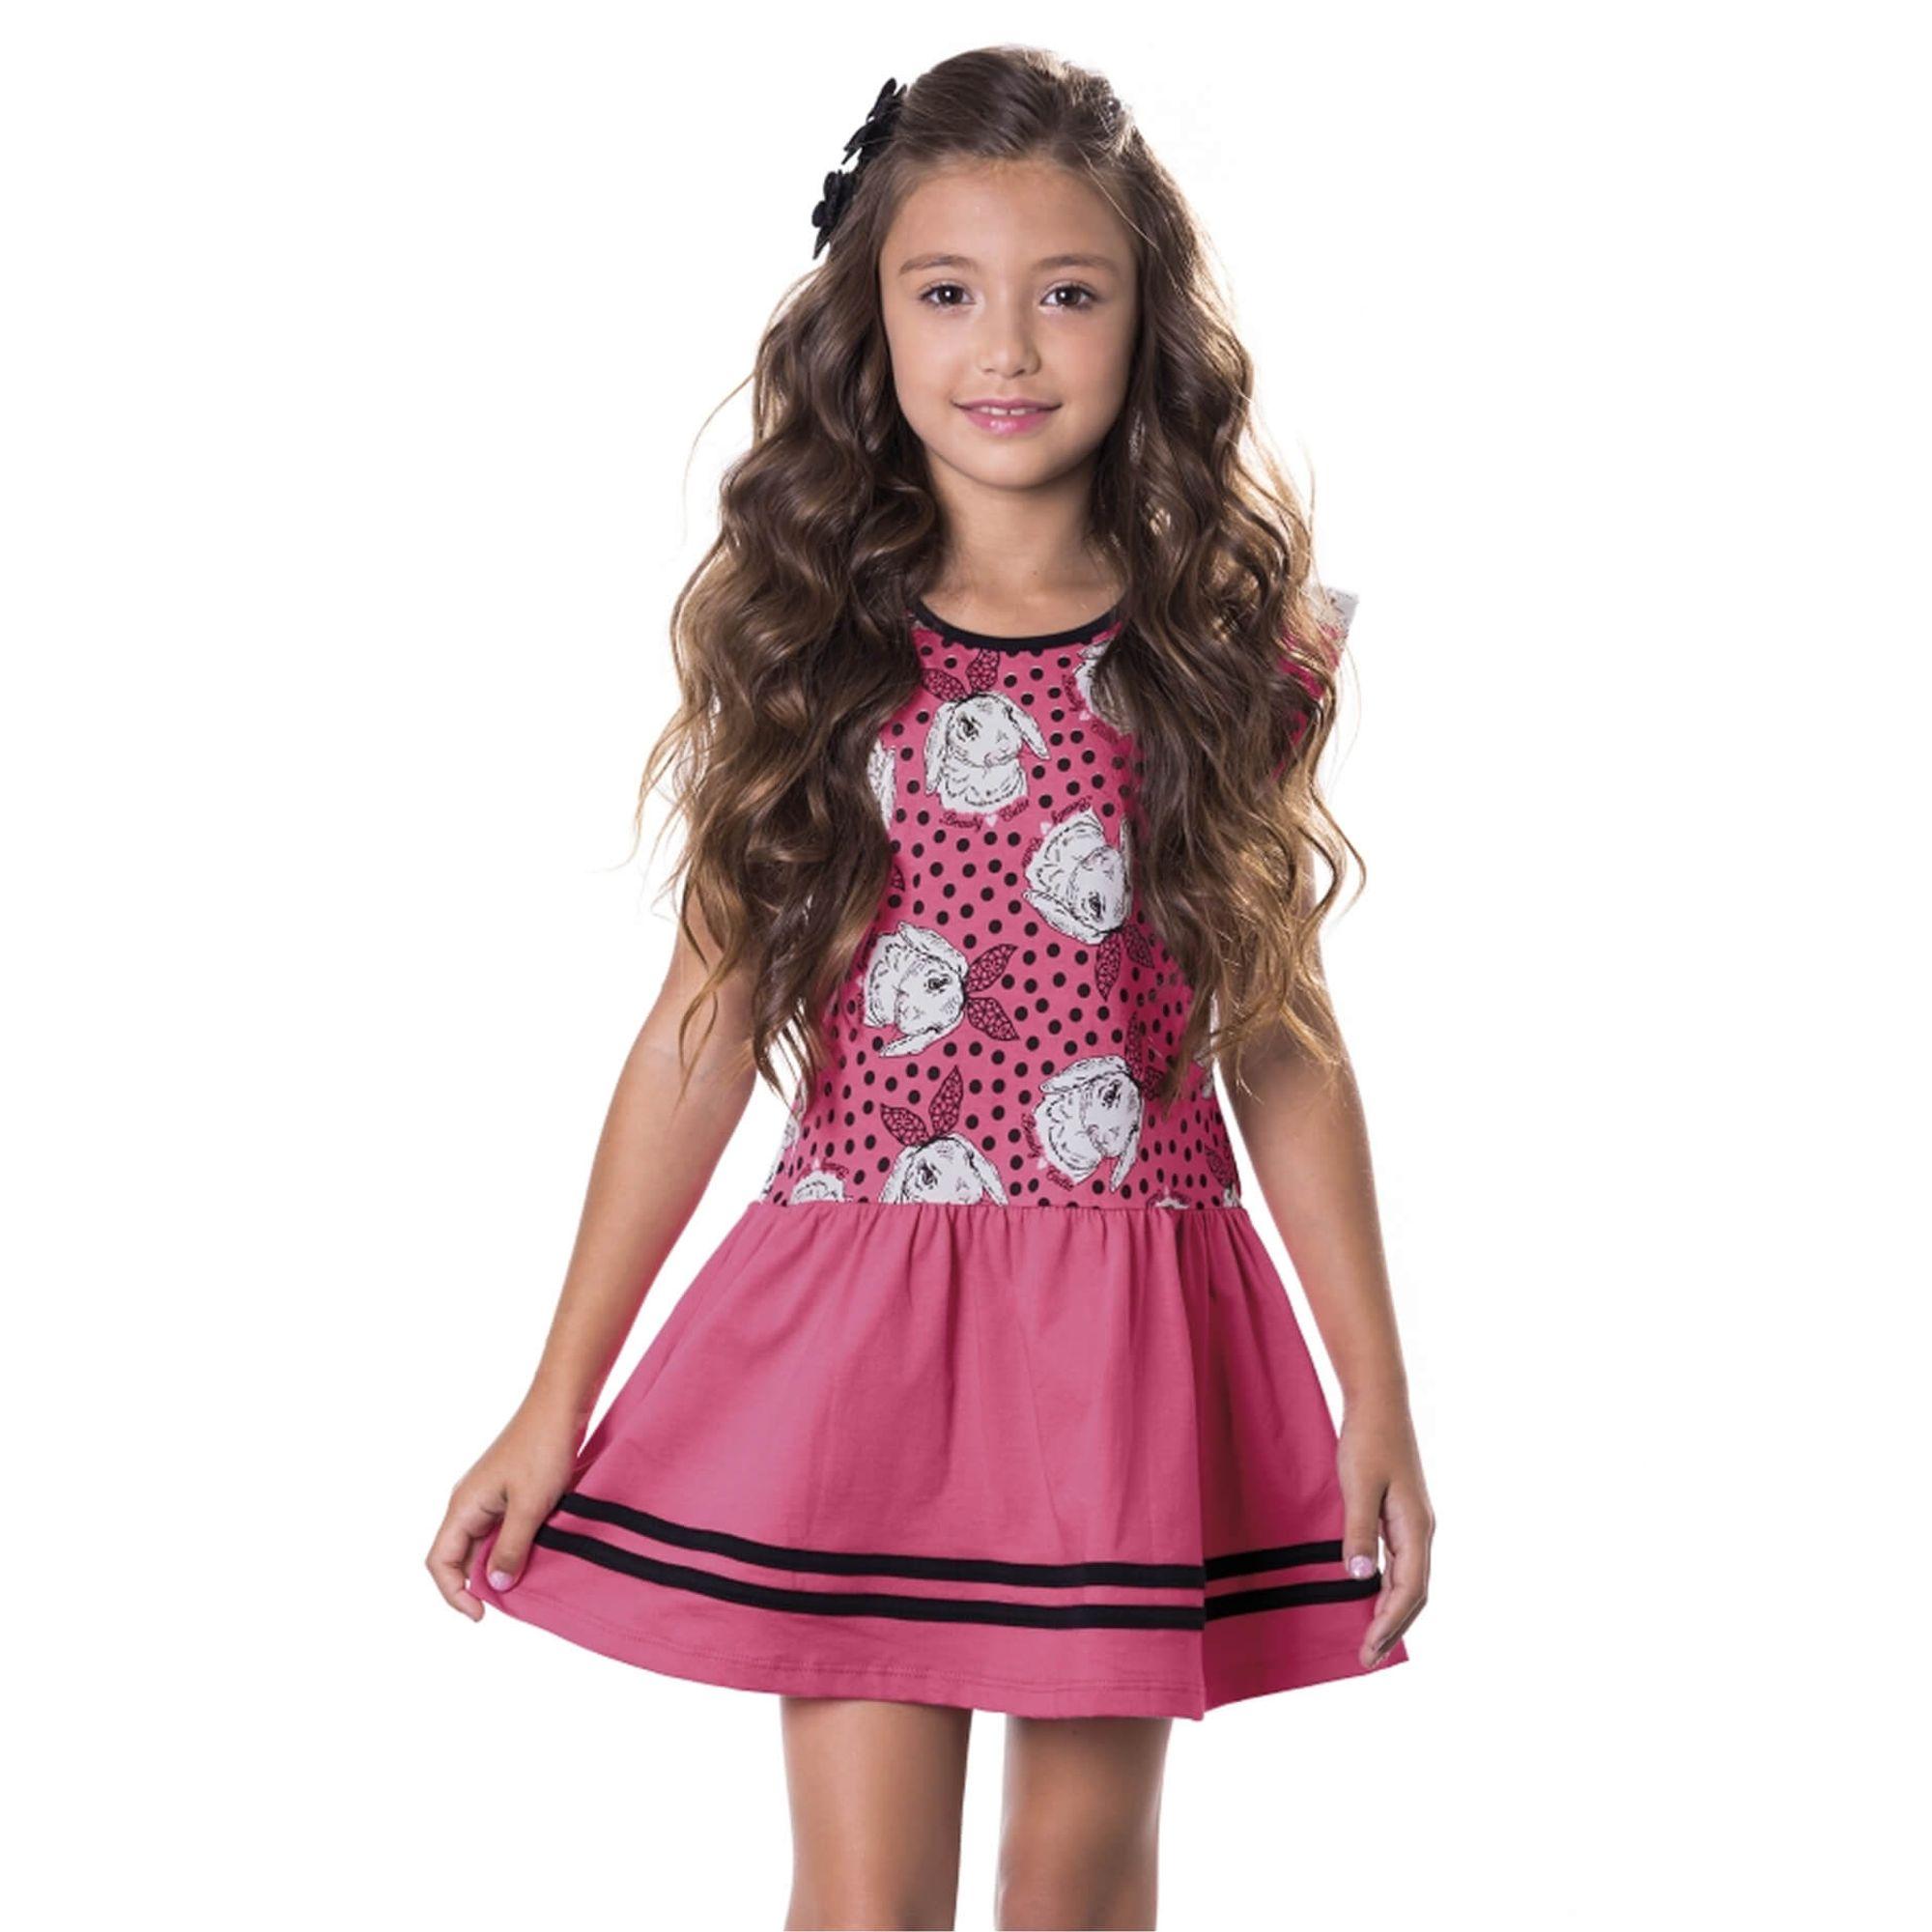 vestido-infantil-meia-malha-rosa-estampa-coelhinhos-1